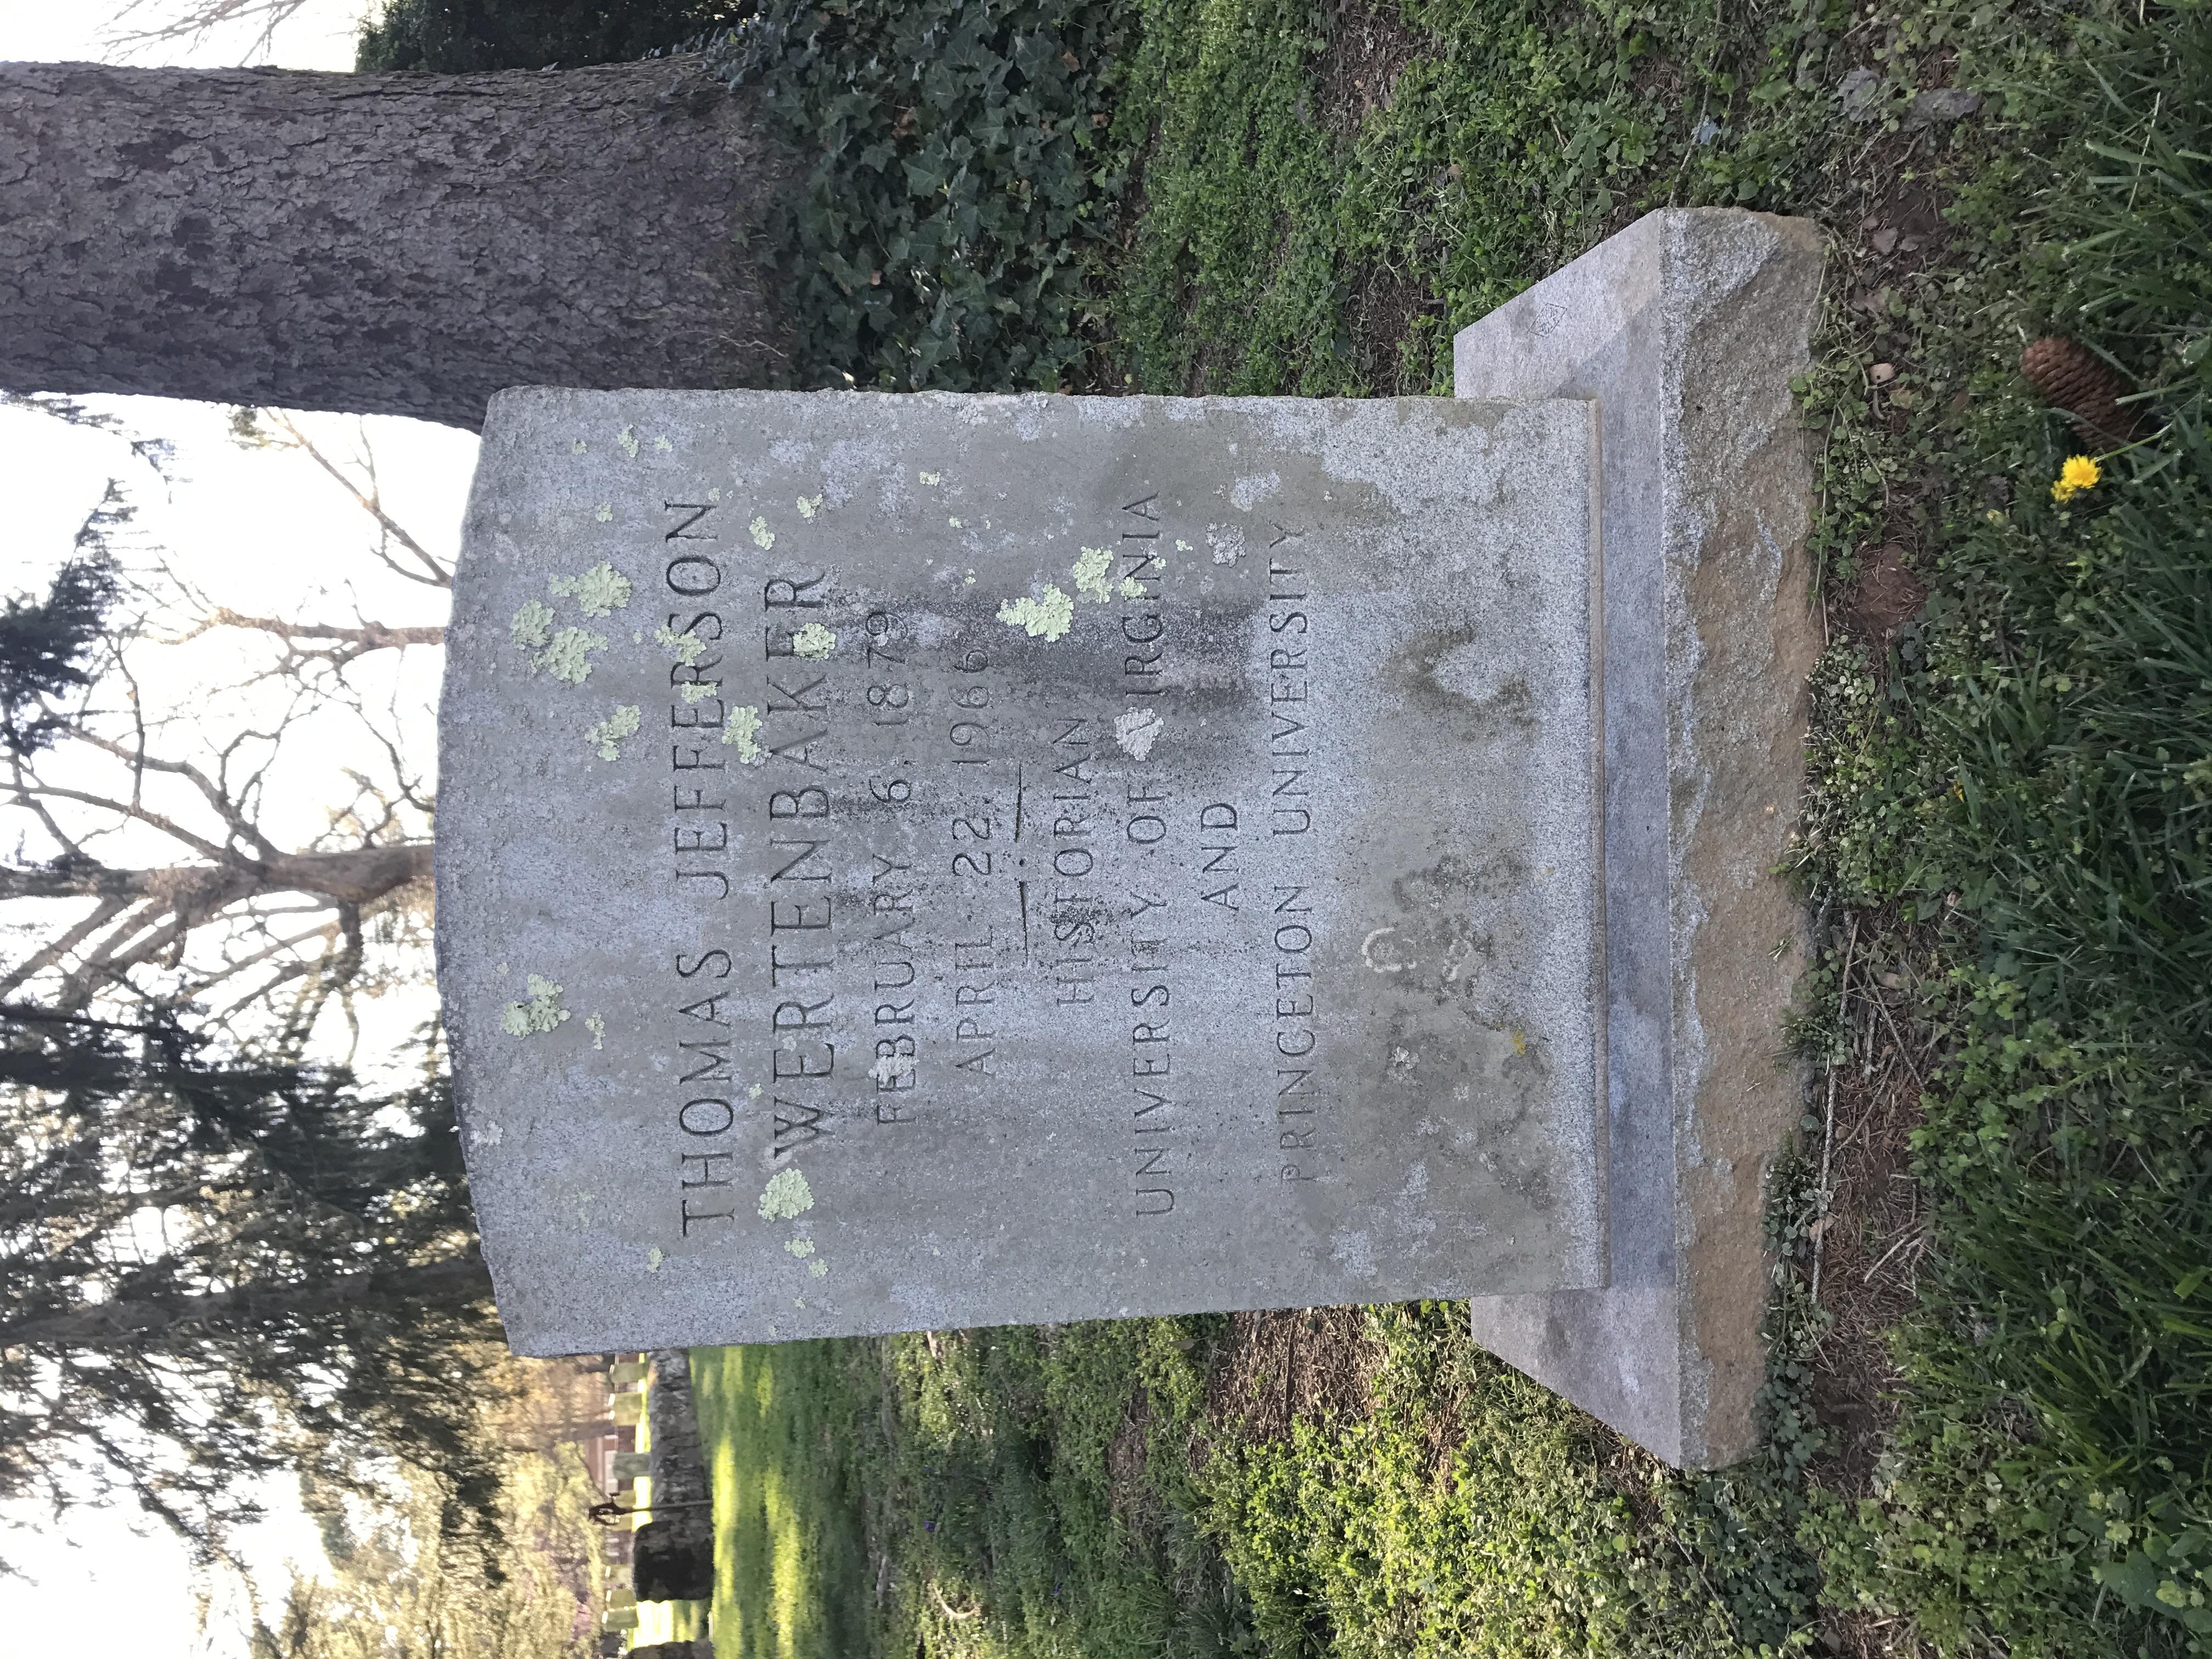 Wertenbaker's gravestone at the [[University of Virginia Cemetery